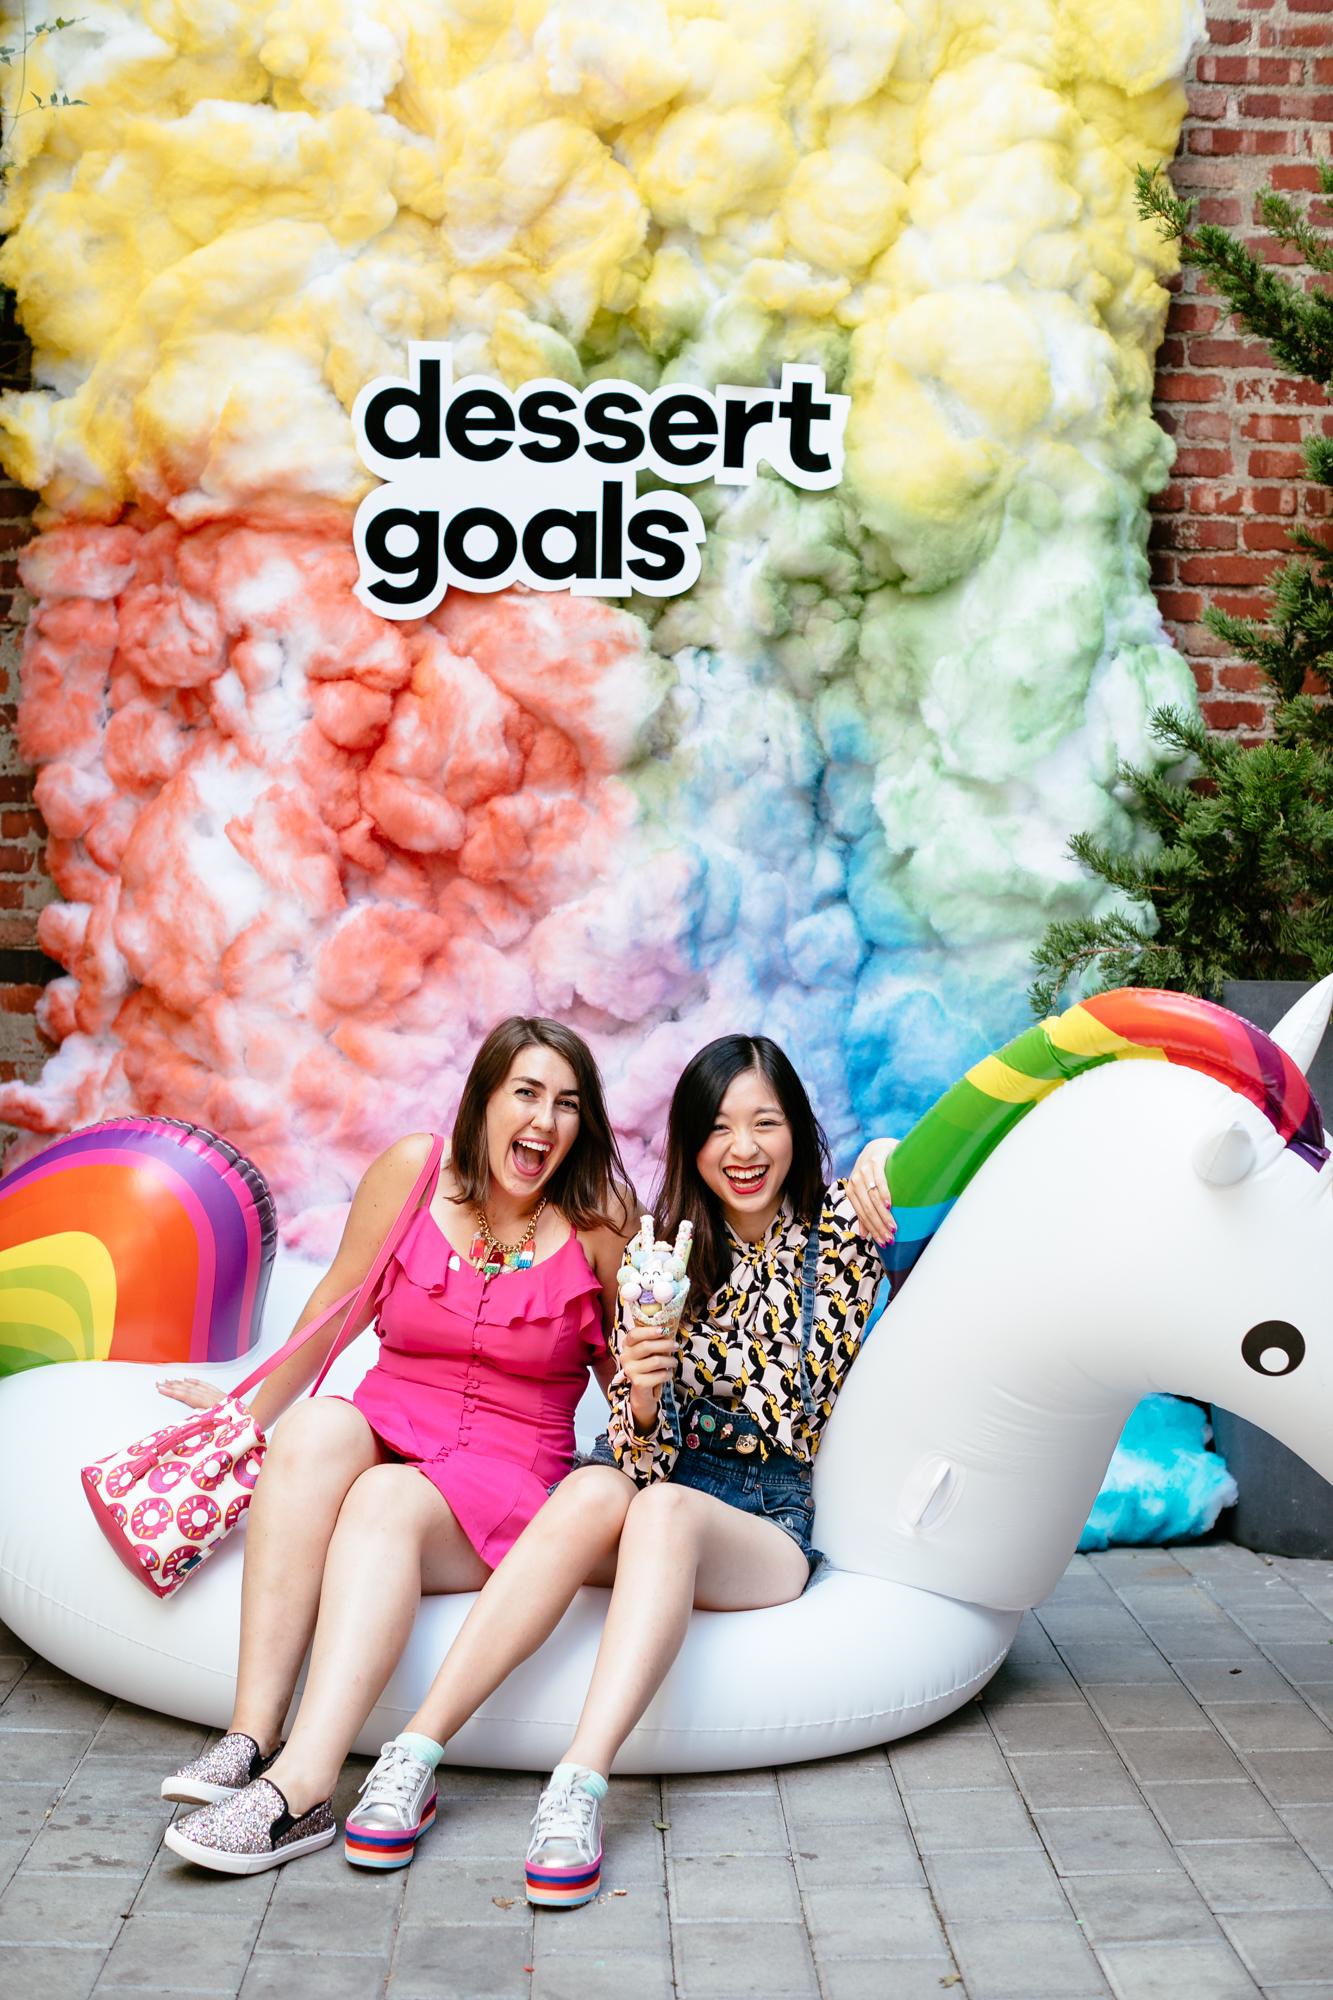 dessert goals 2018 weekend rundown